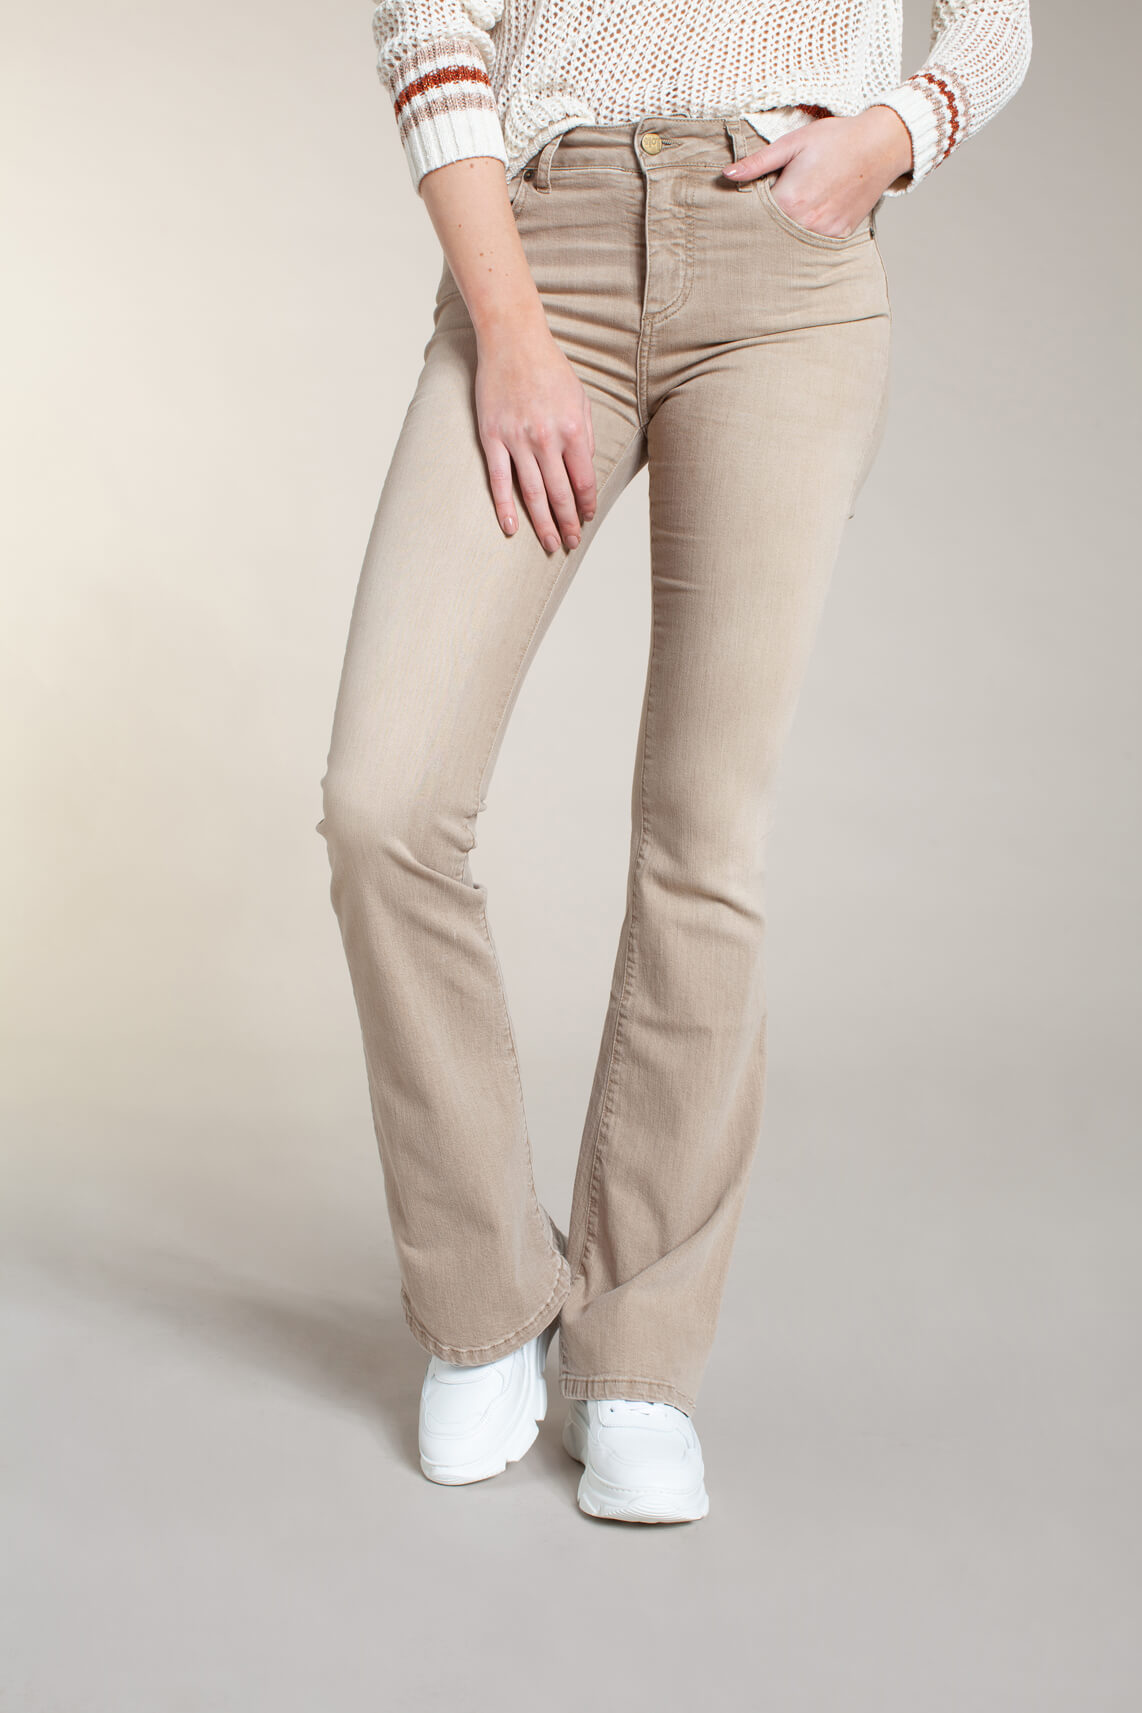 Lois Dames Raval flared jeans Bruin